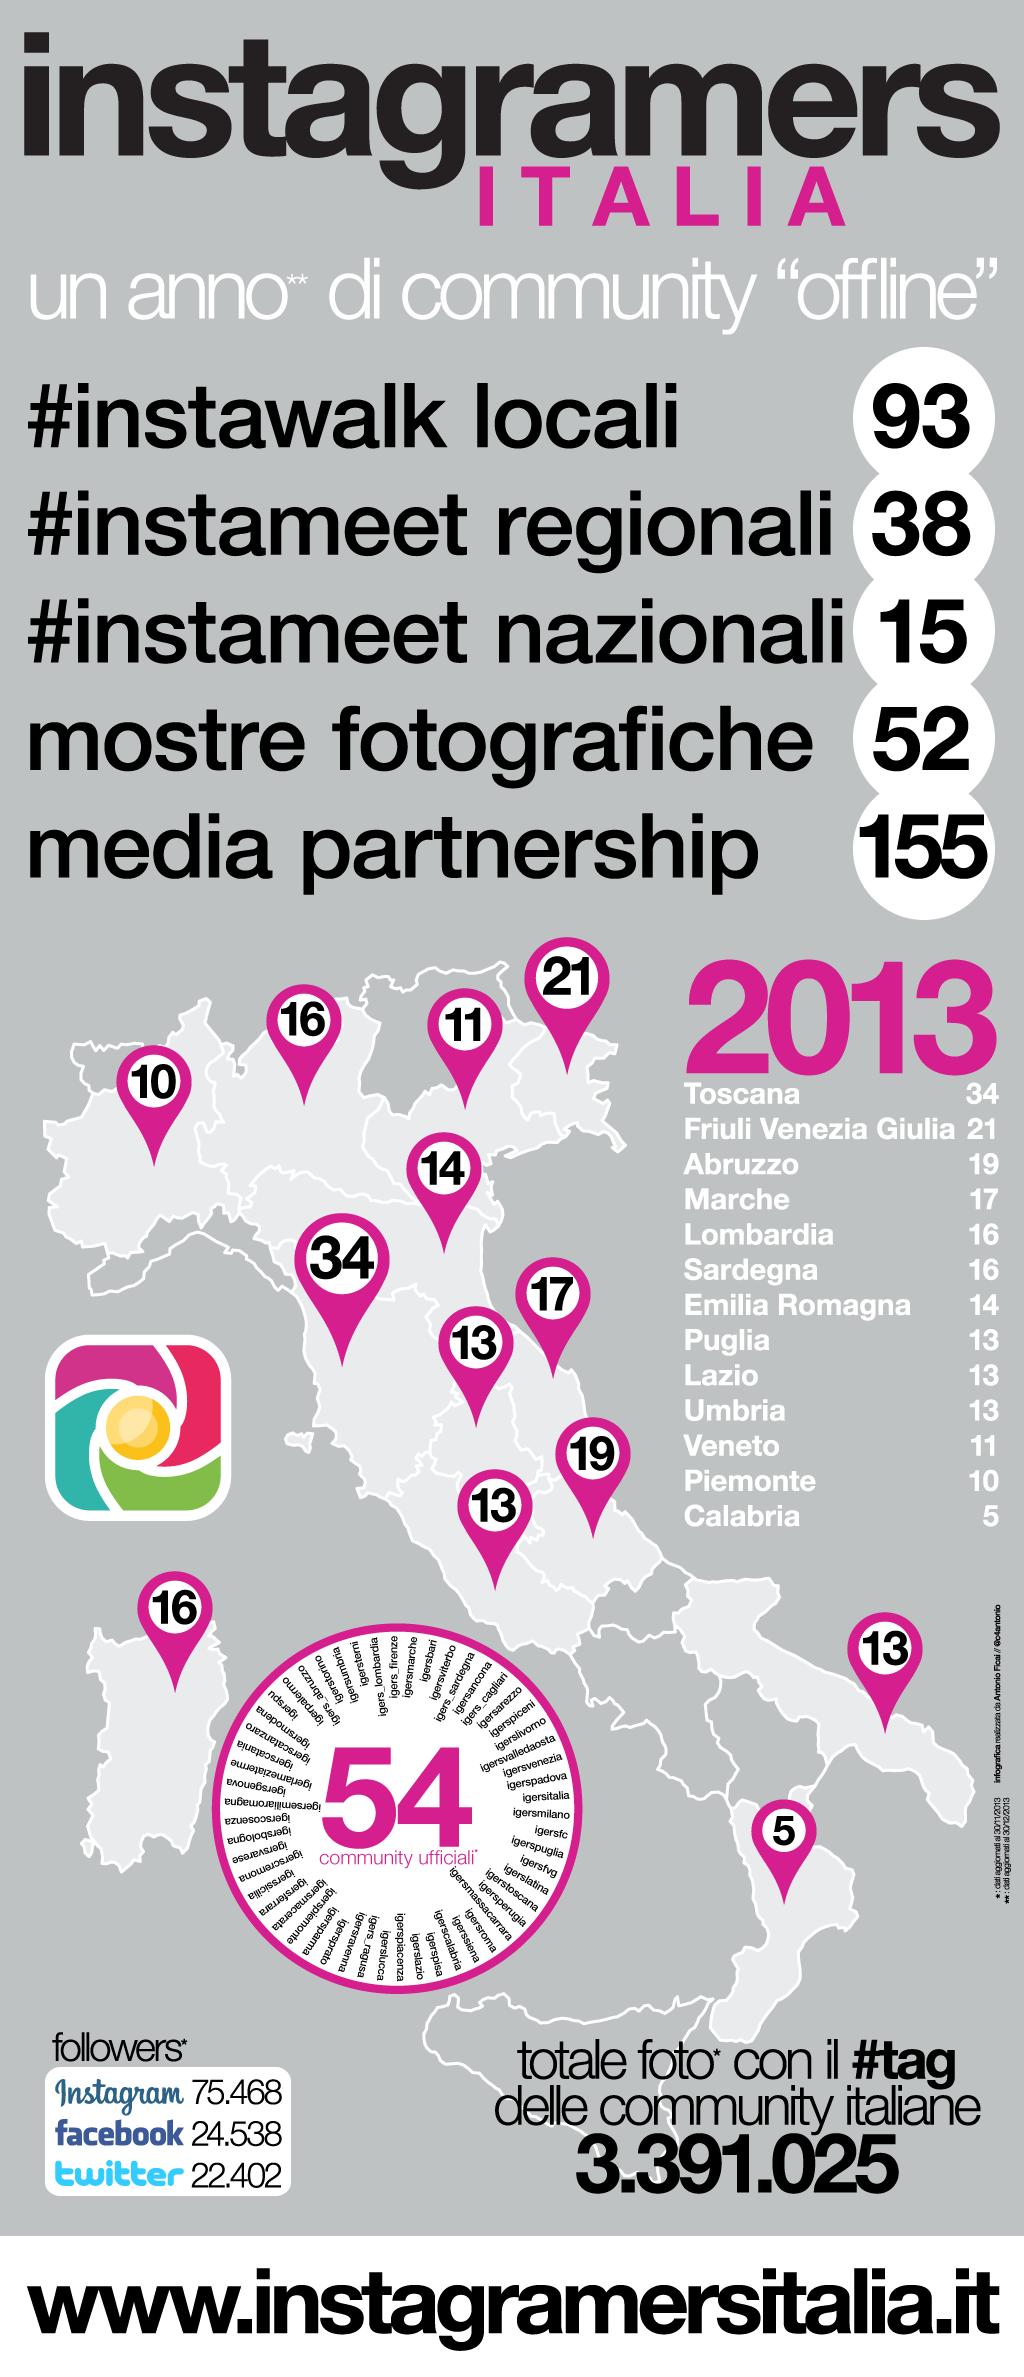 instagramers italia 2013 infographic